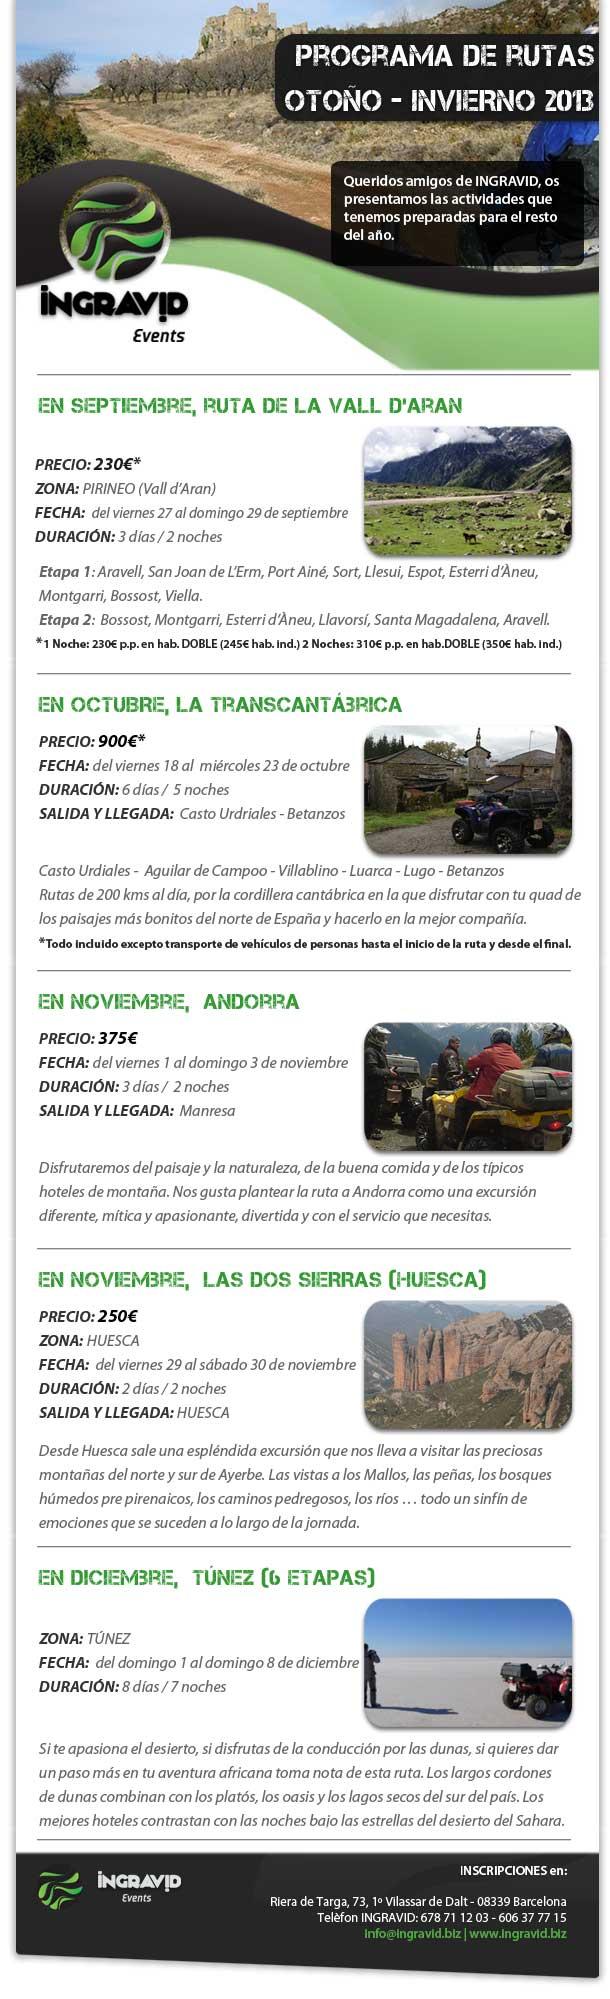 News-AVANCE-TEMPORADA-OTOÑO-INVIERNO-2013